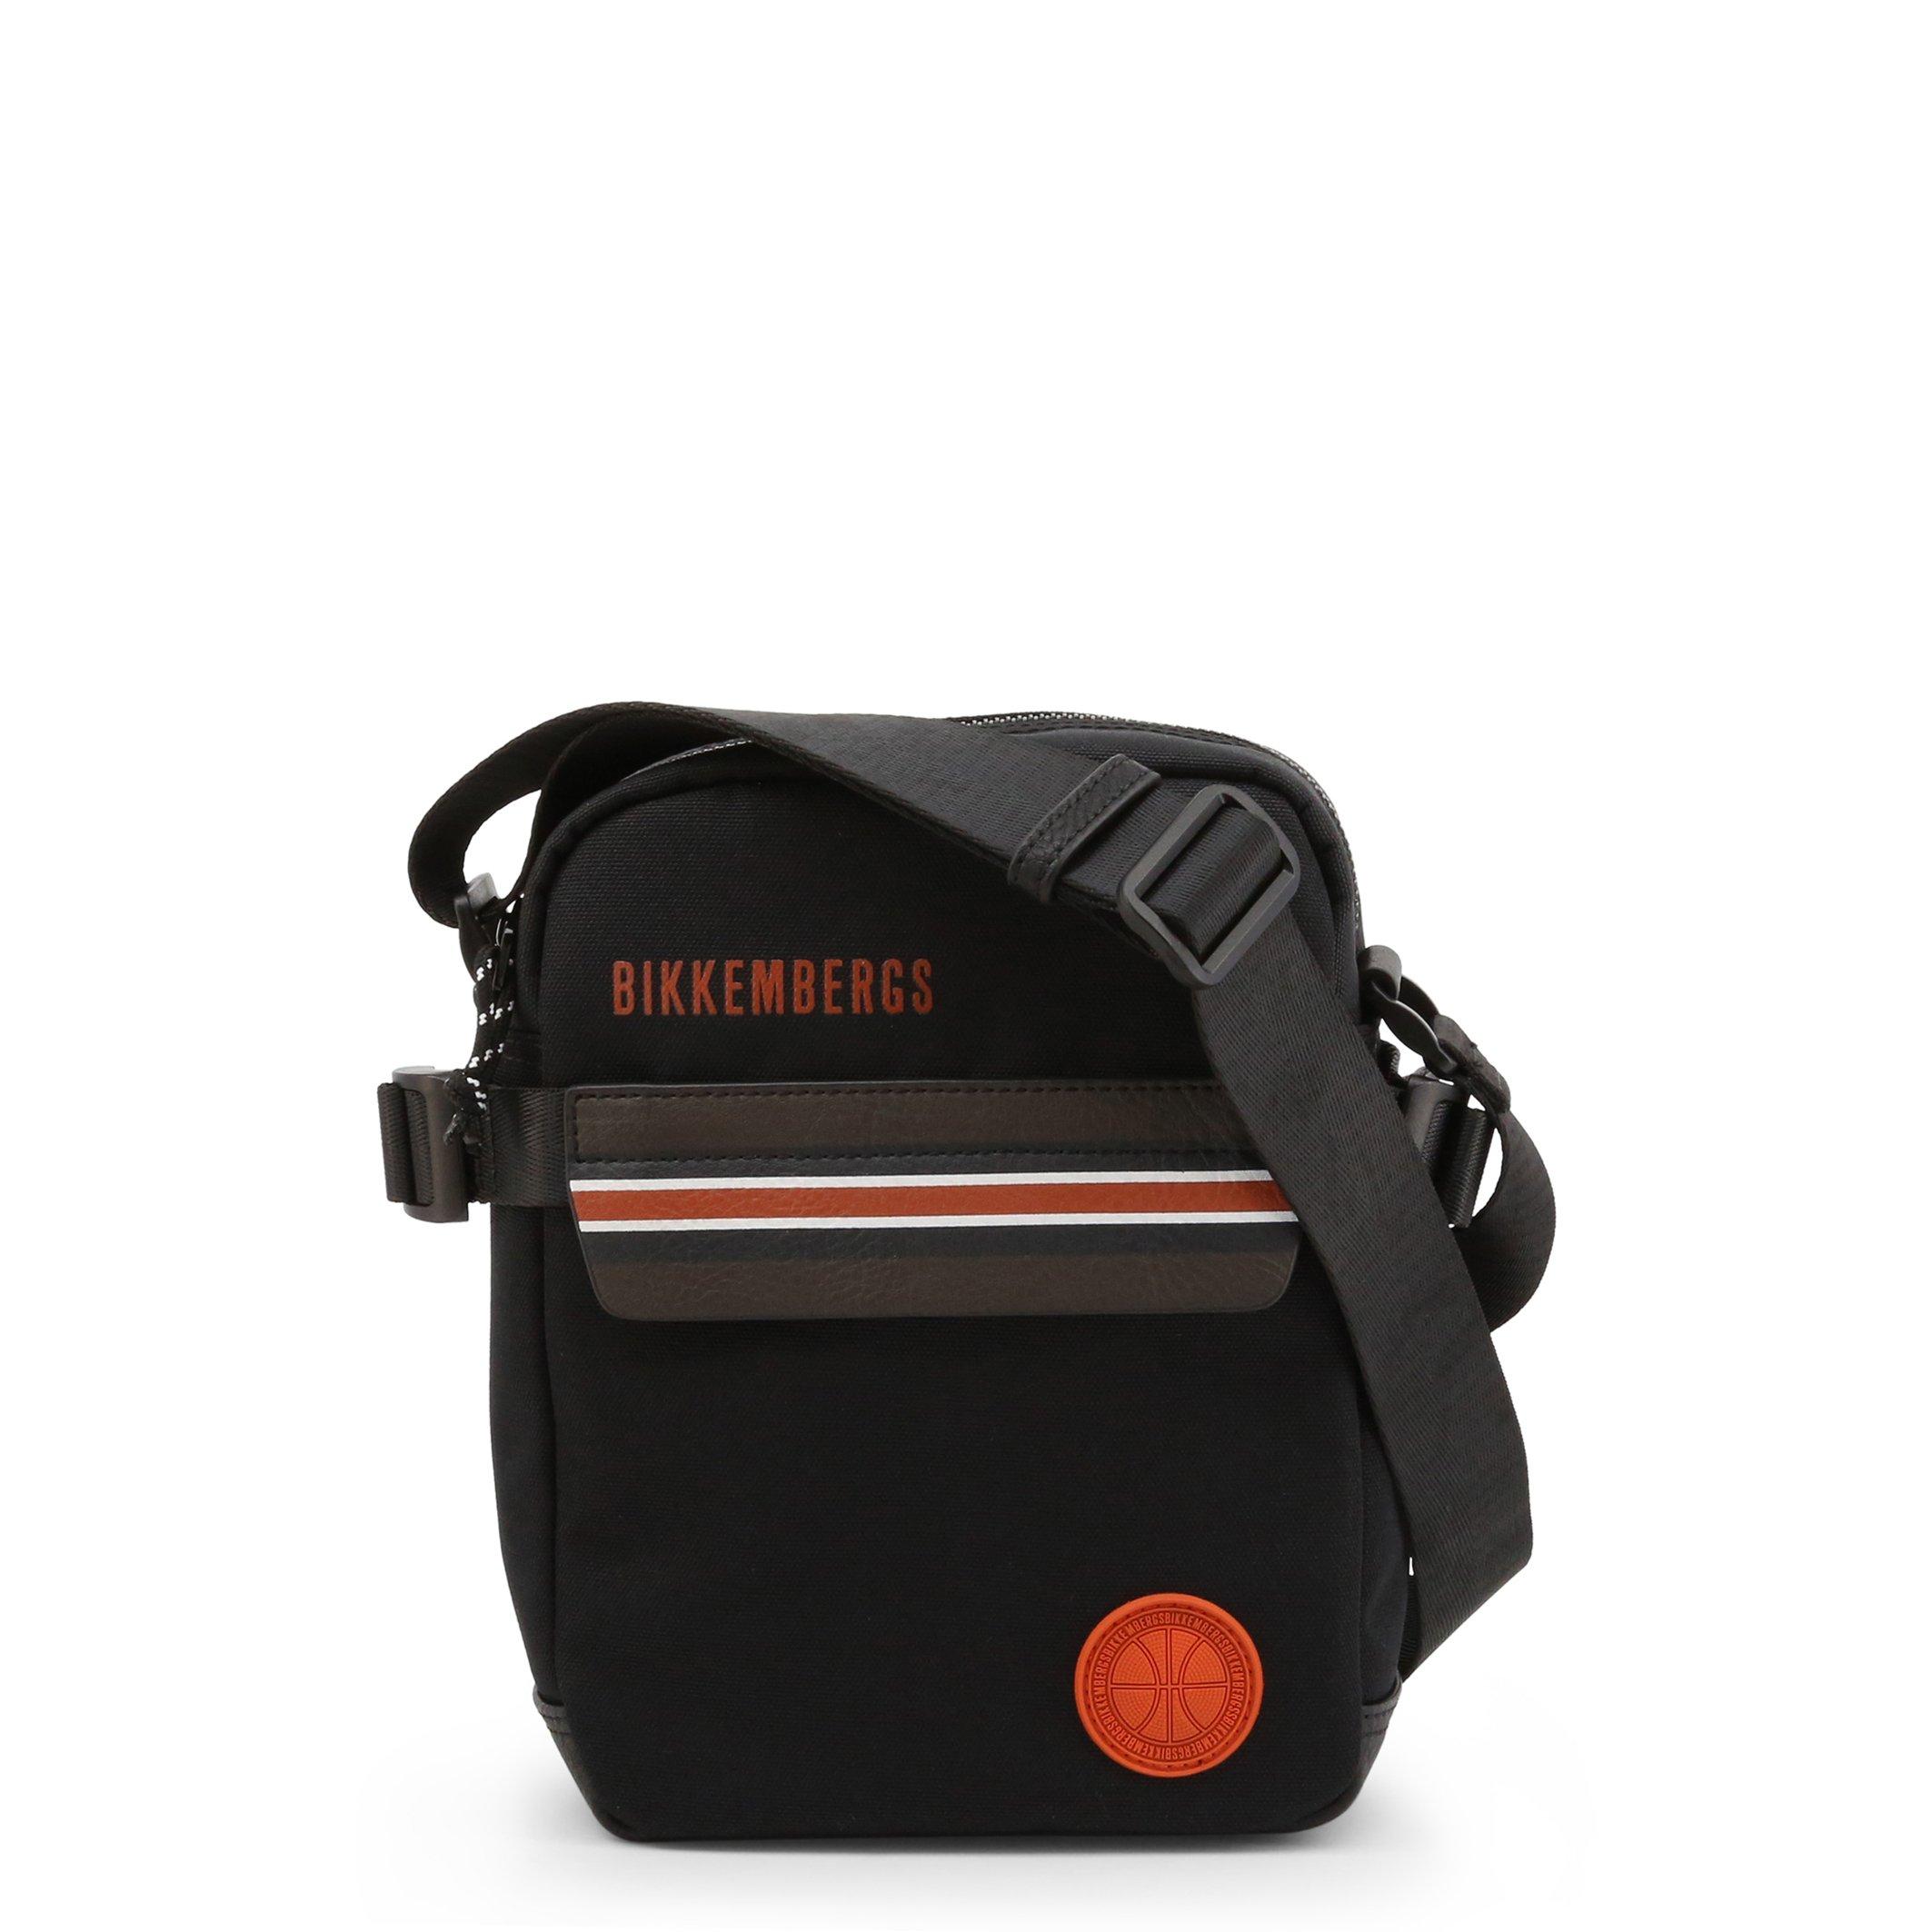 Bikkembergs Men's Crossbody Bag Blue E4APME2A0012 - black NOSIZE